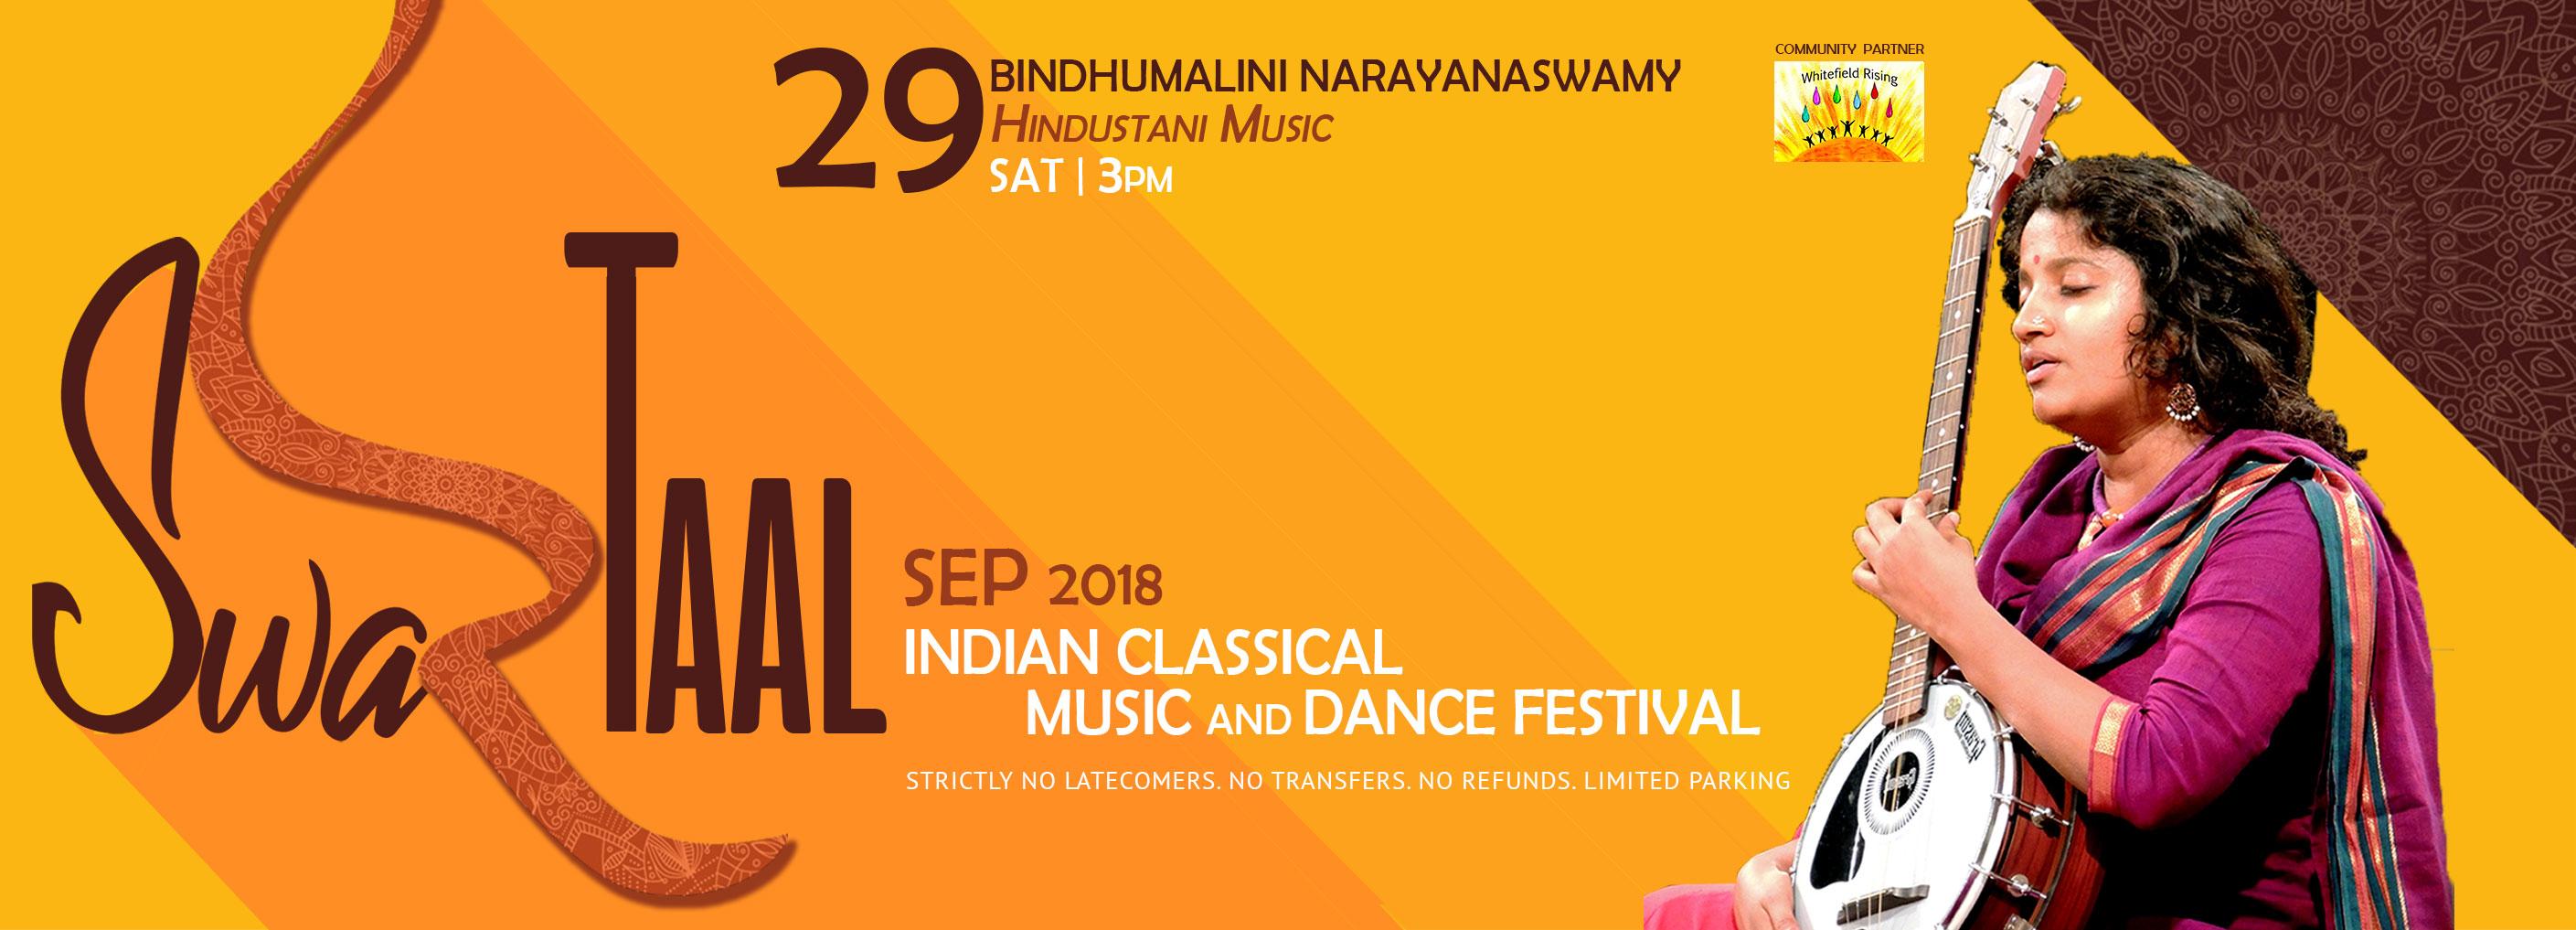 SwarTaal –  Bindhumalini Narayanaswamy